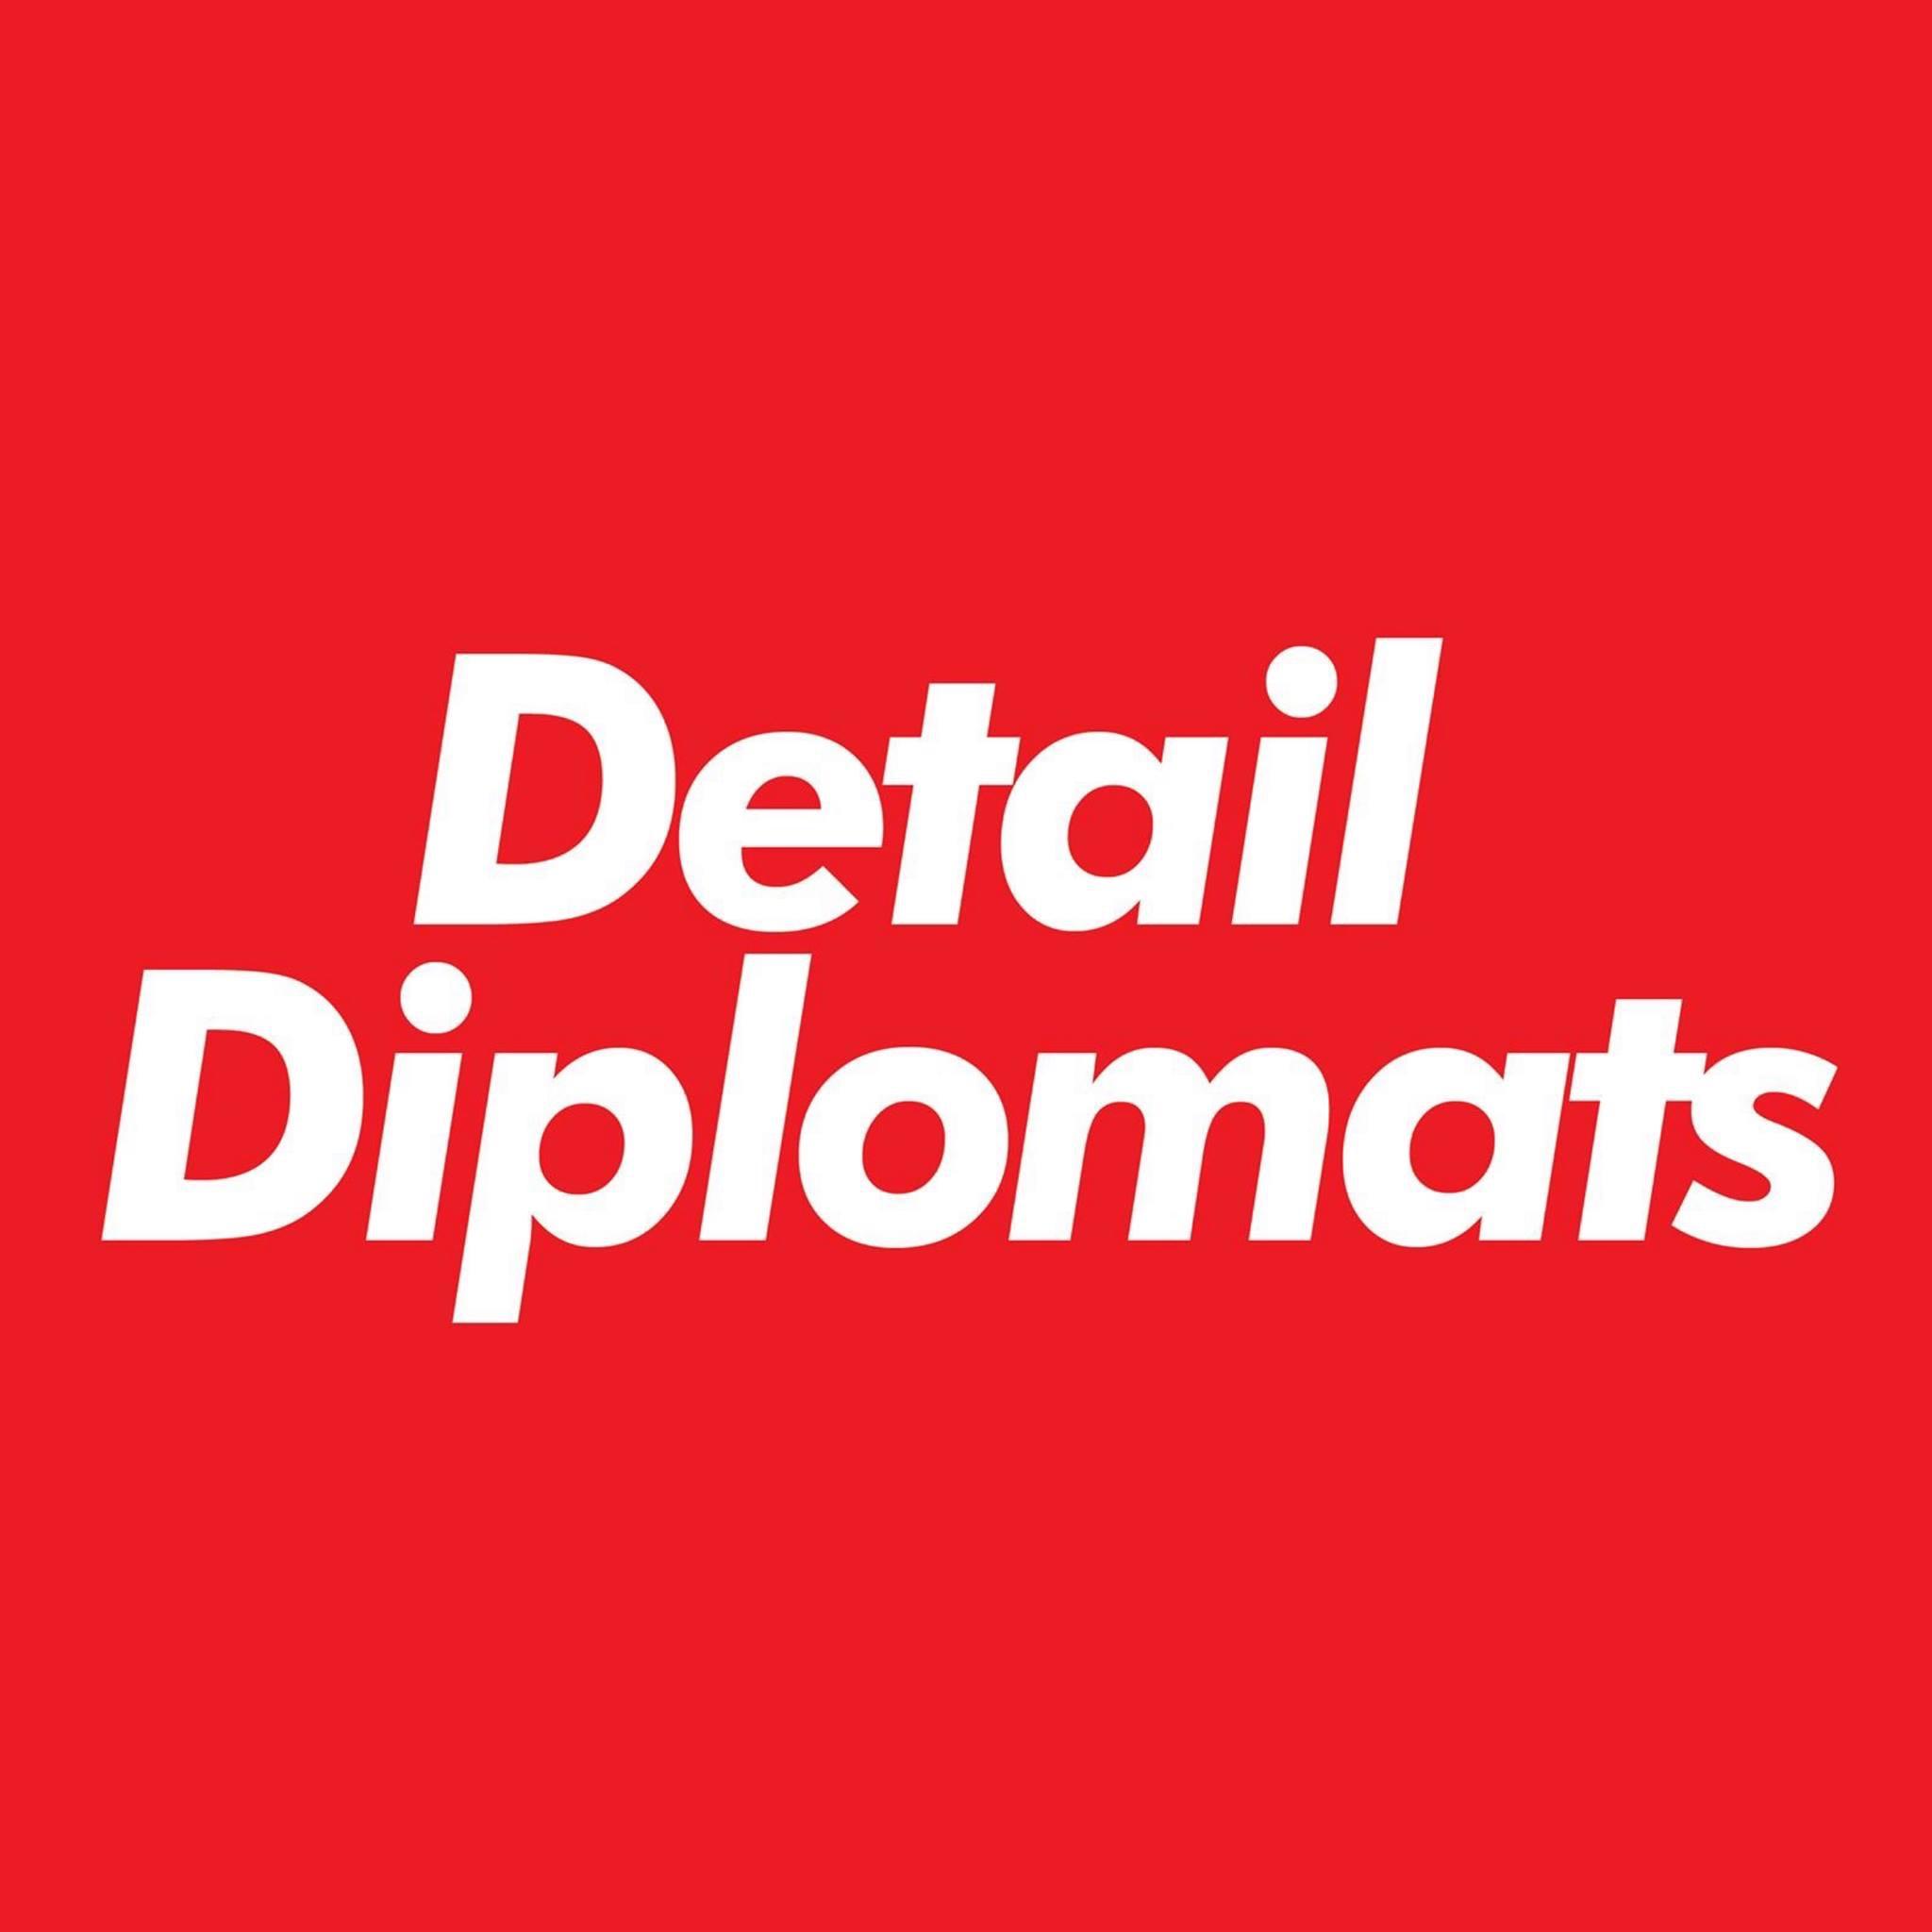 Detail Diplomats